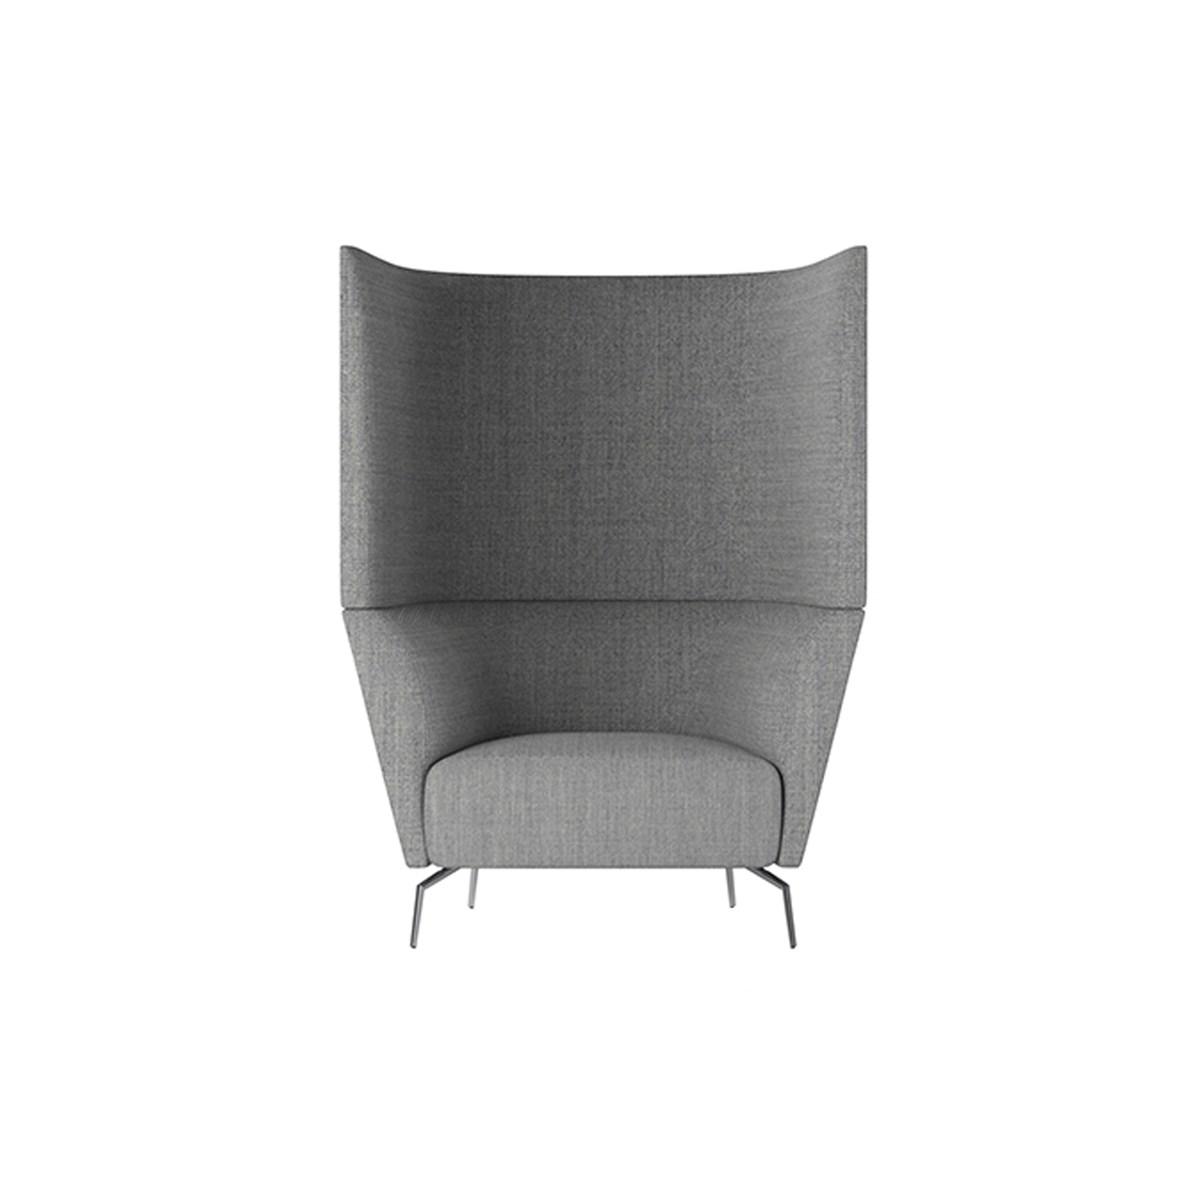 Neospace-Ridgeway-Sofa-System-Contract-Matisse-1